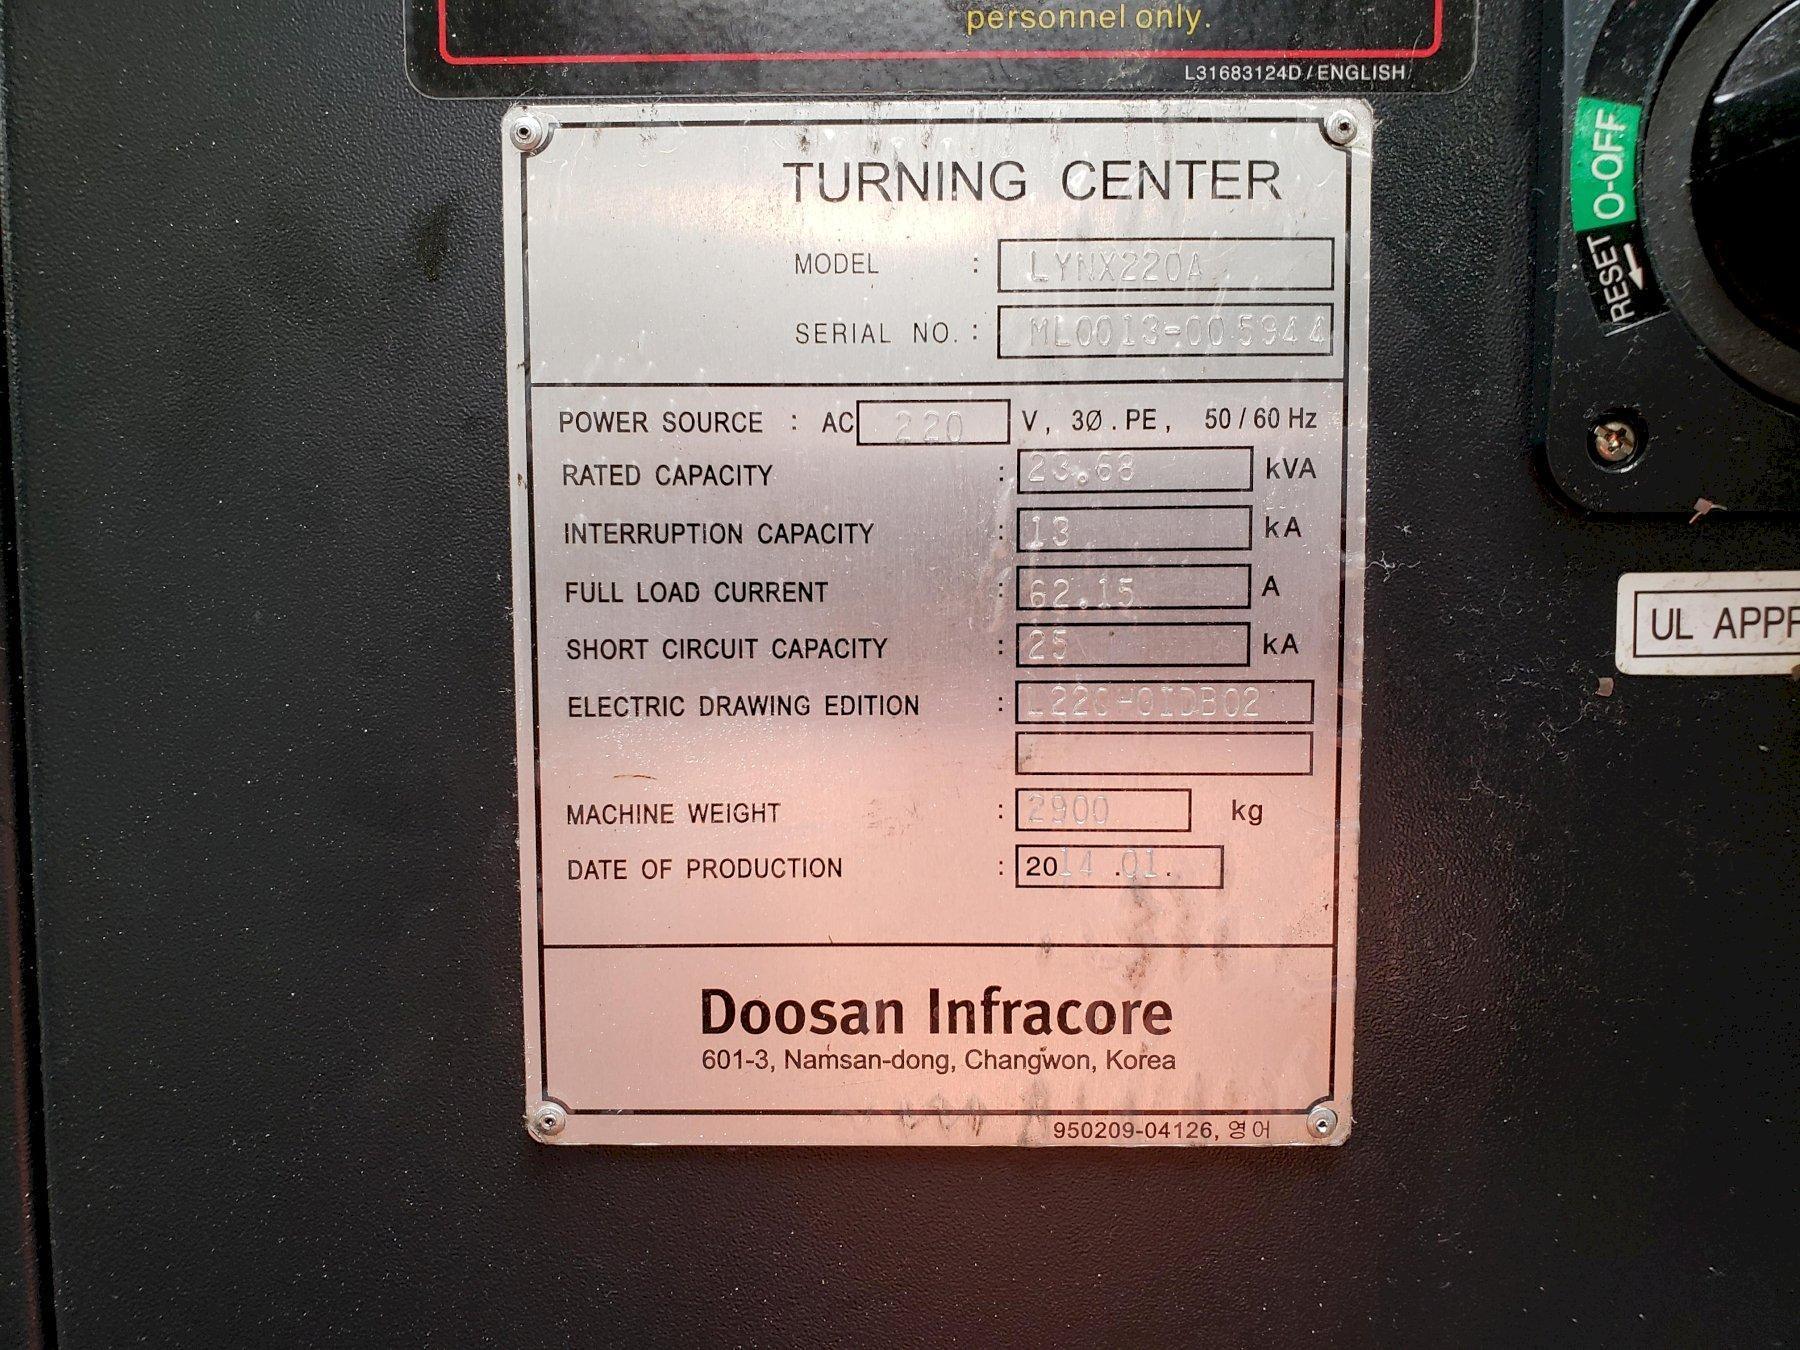 "Doosan Lynx 220A CNC Lathe 2014 with: Fanuc i Series CNC Control, 6"" chuck, Tool Presetter, Tailstock, and Chip Conveyor."